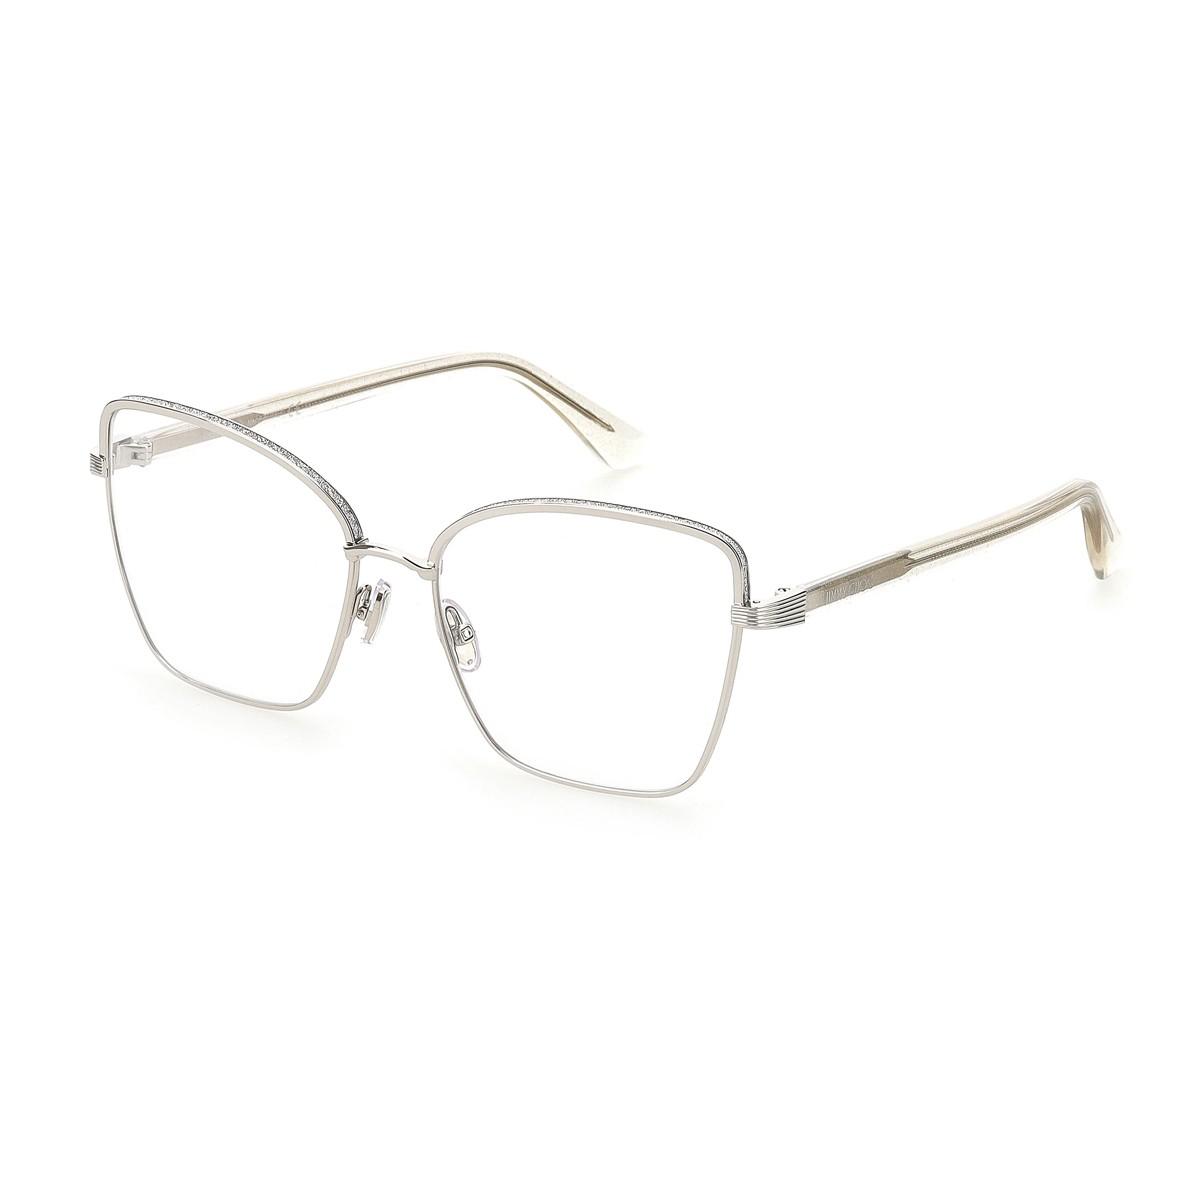 Jimmy Choo Jc266 | Women's eyeglasses